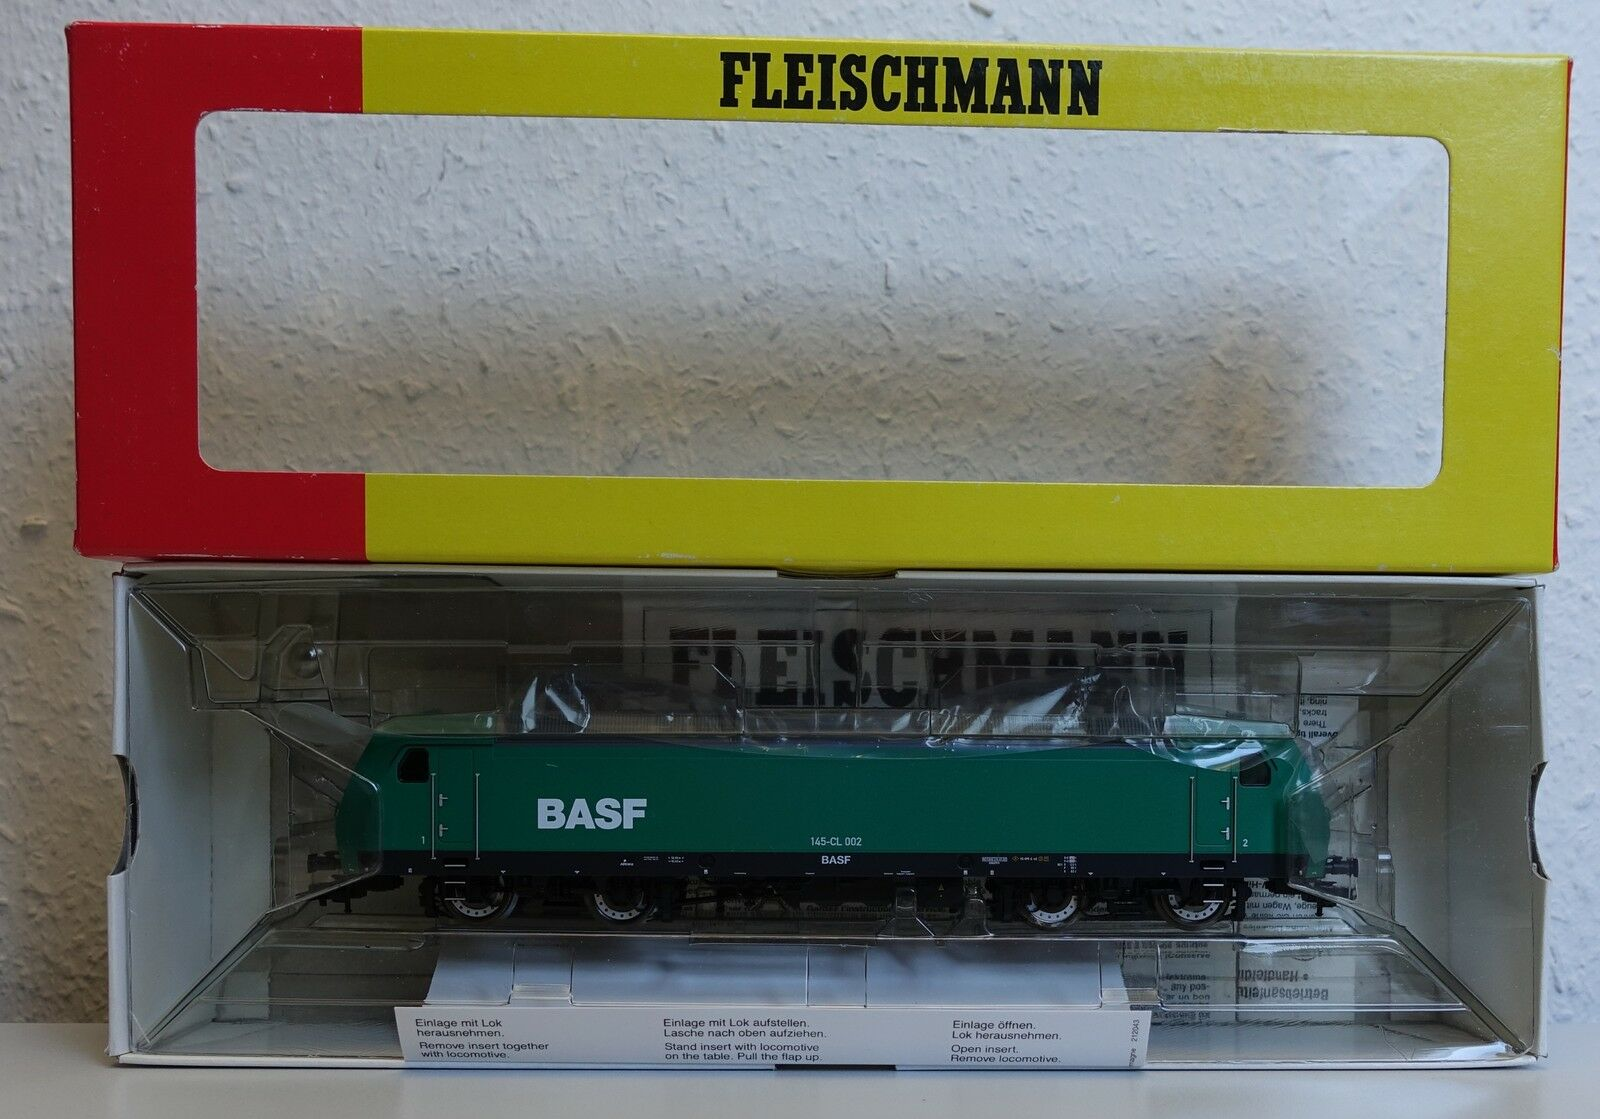 Fleischmann 80 4320 804320 br145-cl002 Elektrolok BASF OVP-h0-Top Condizione